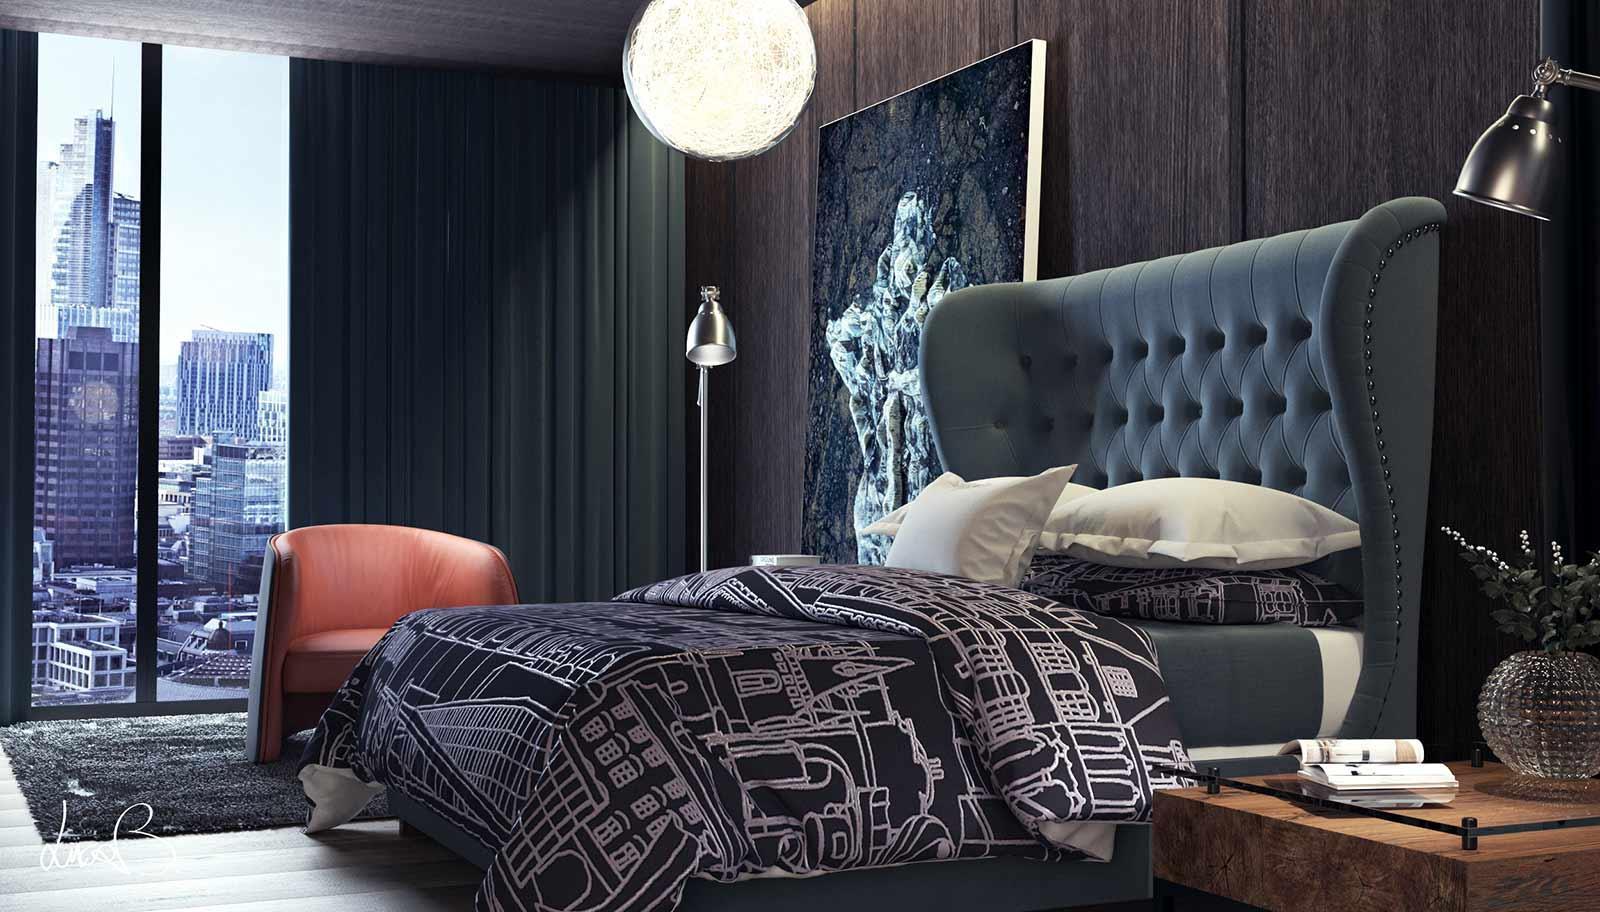 bed40001f.jpg